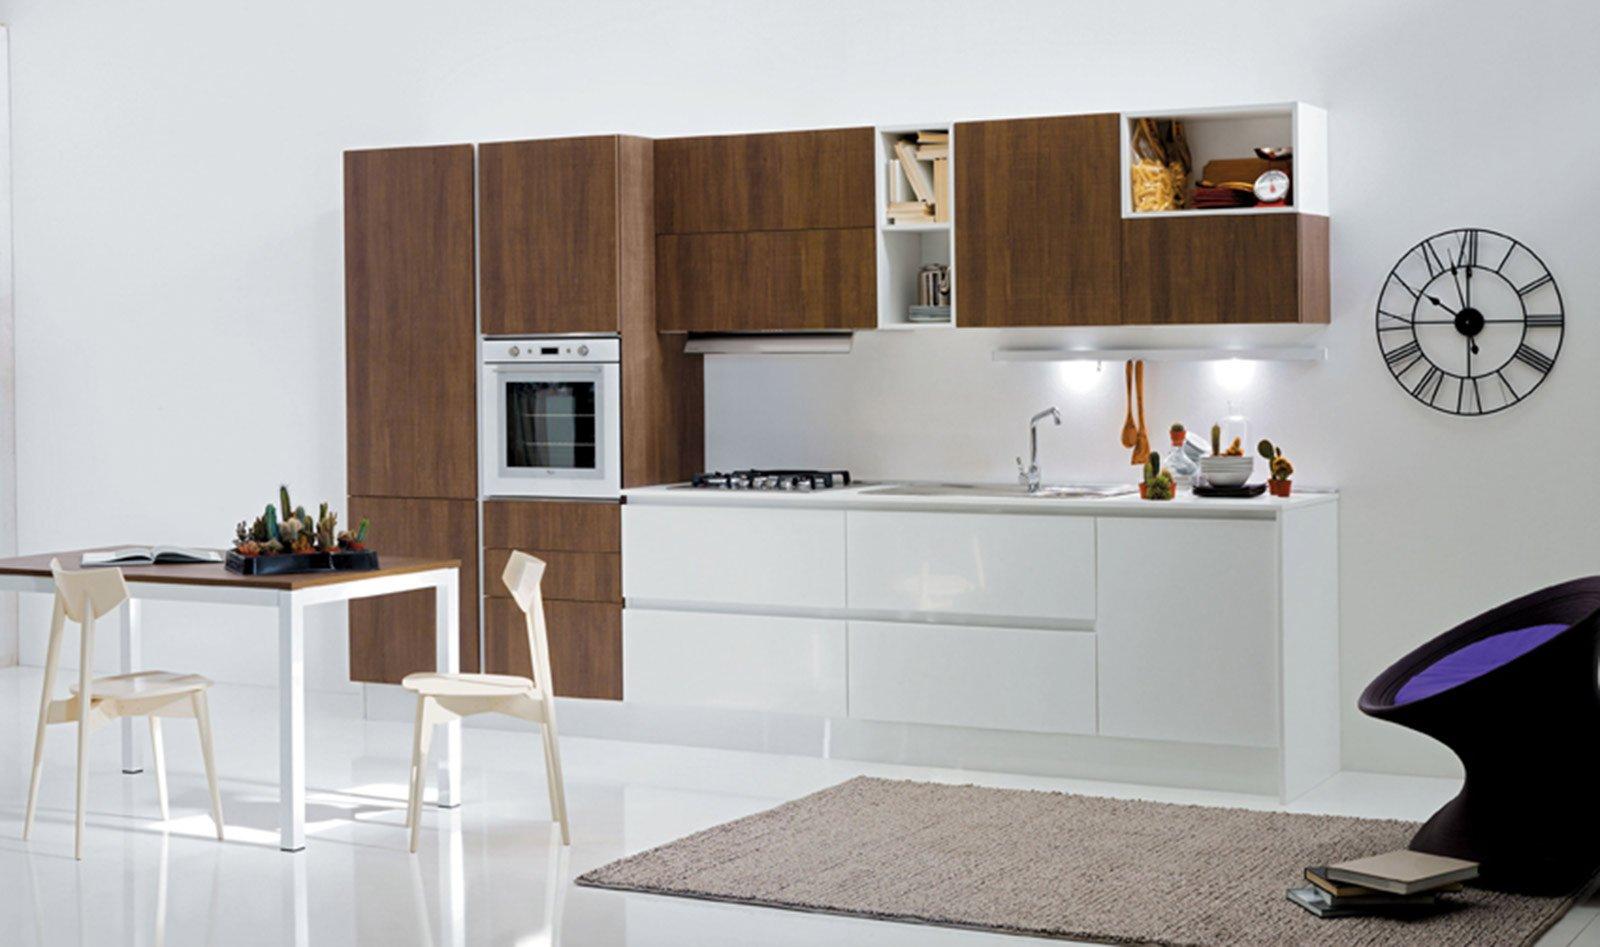 Cucine in laminato cose di casa - Profondita pensili cucina ...